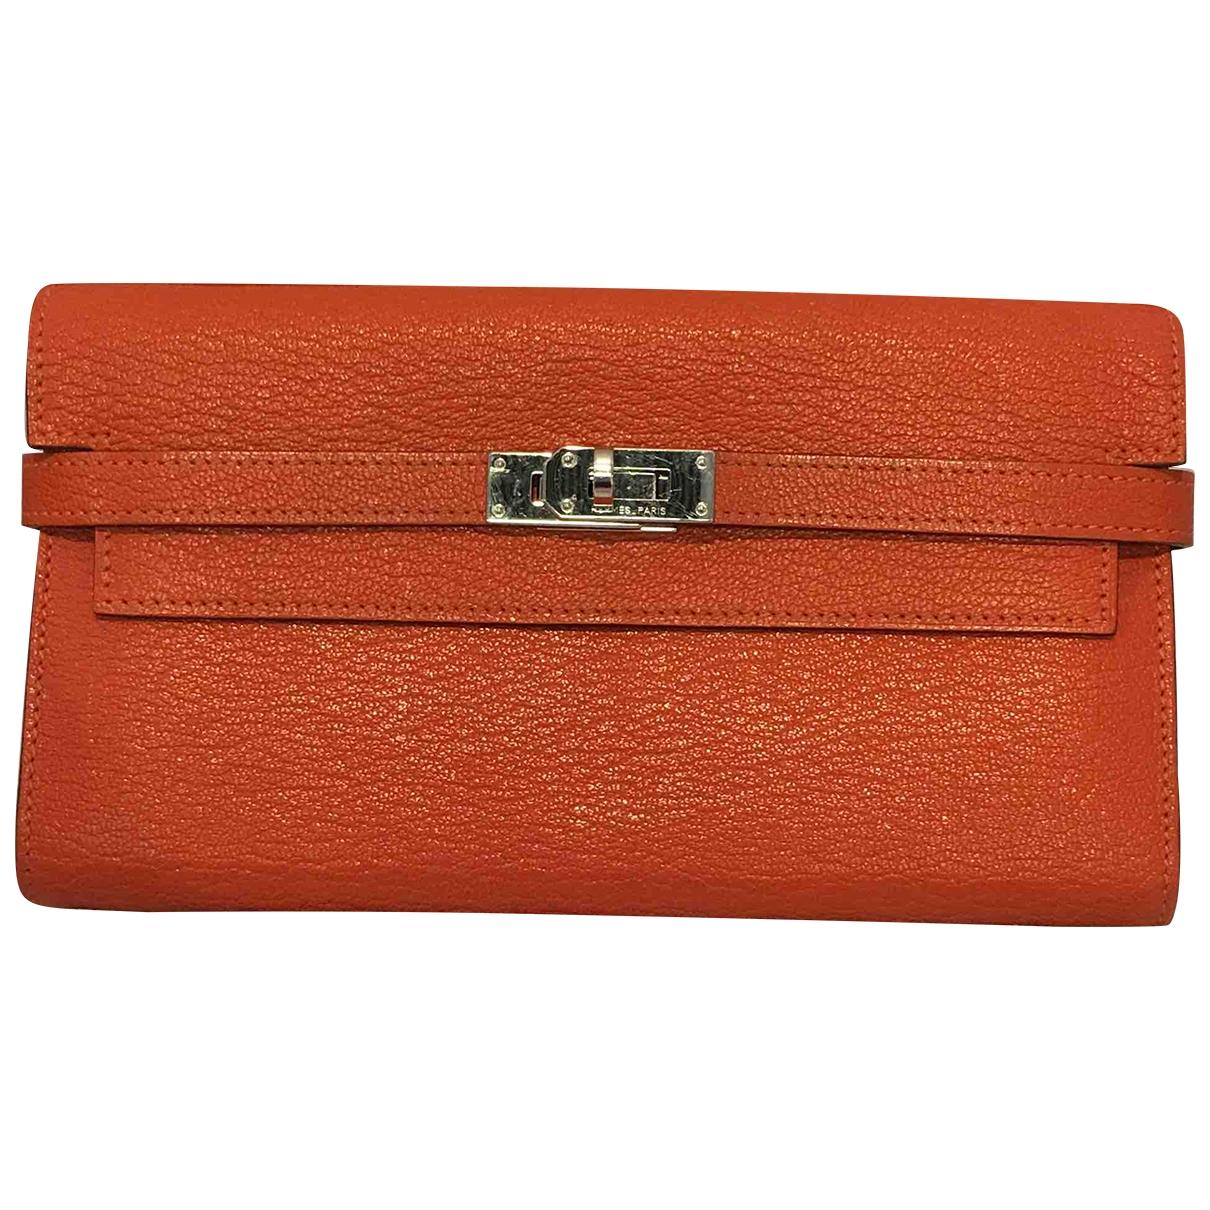 Hermes Kelly Portemonnaie in  Orange Leder